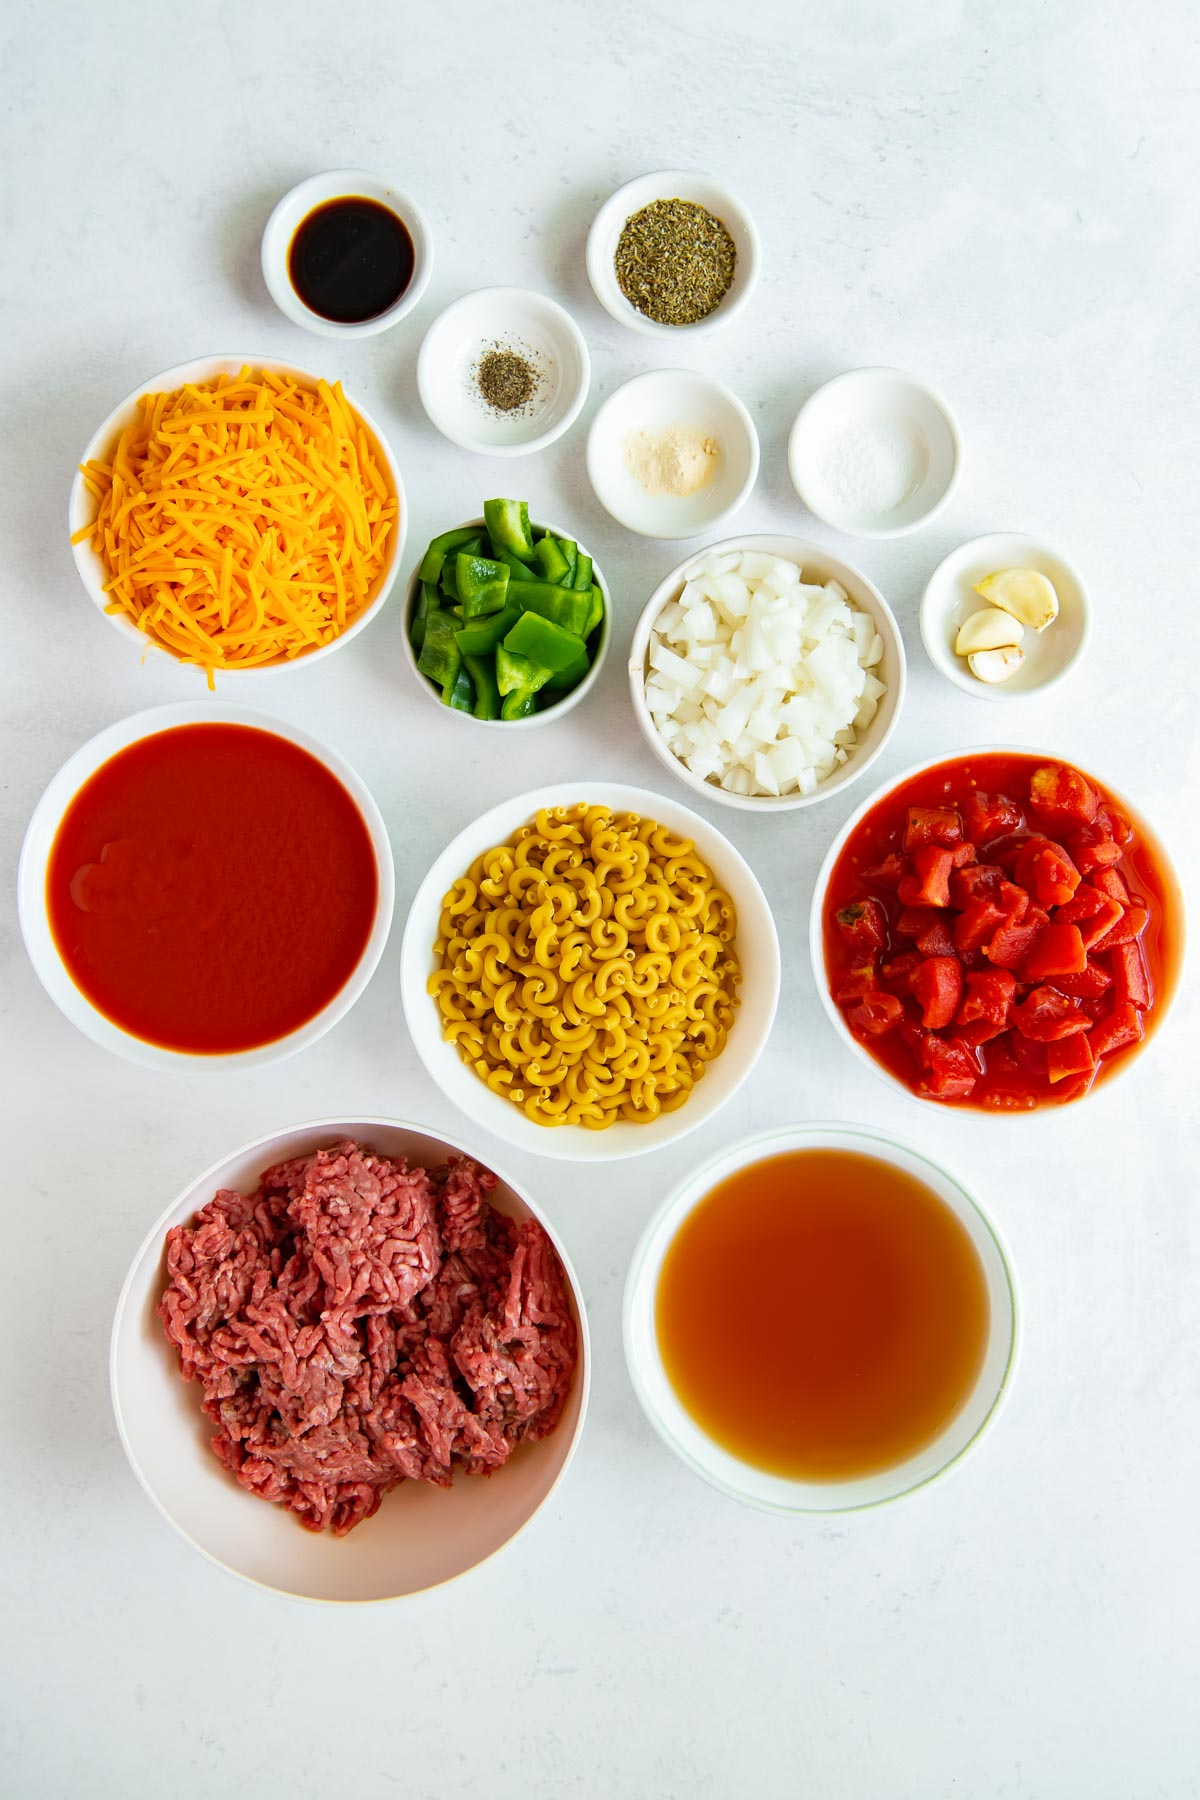 ingredients for instant pot goulash recipe